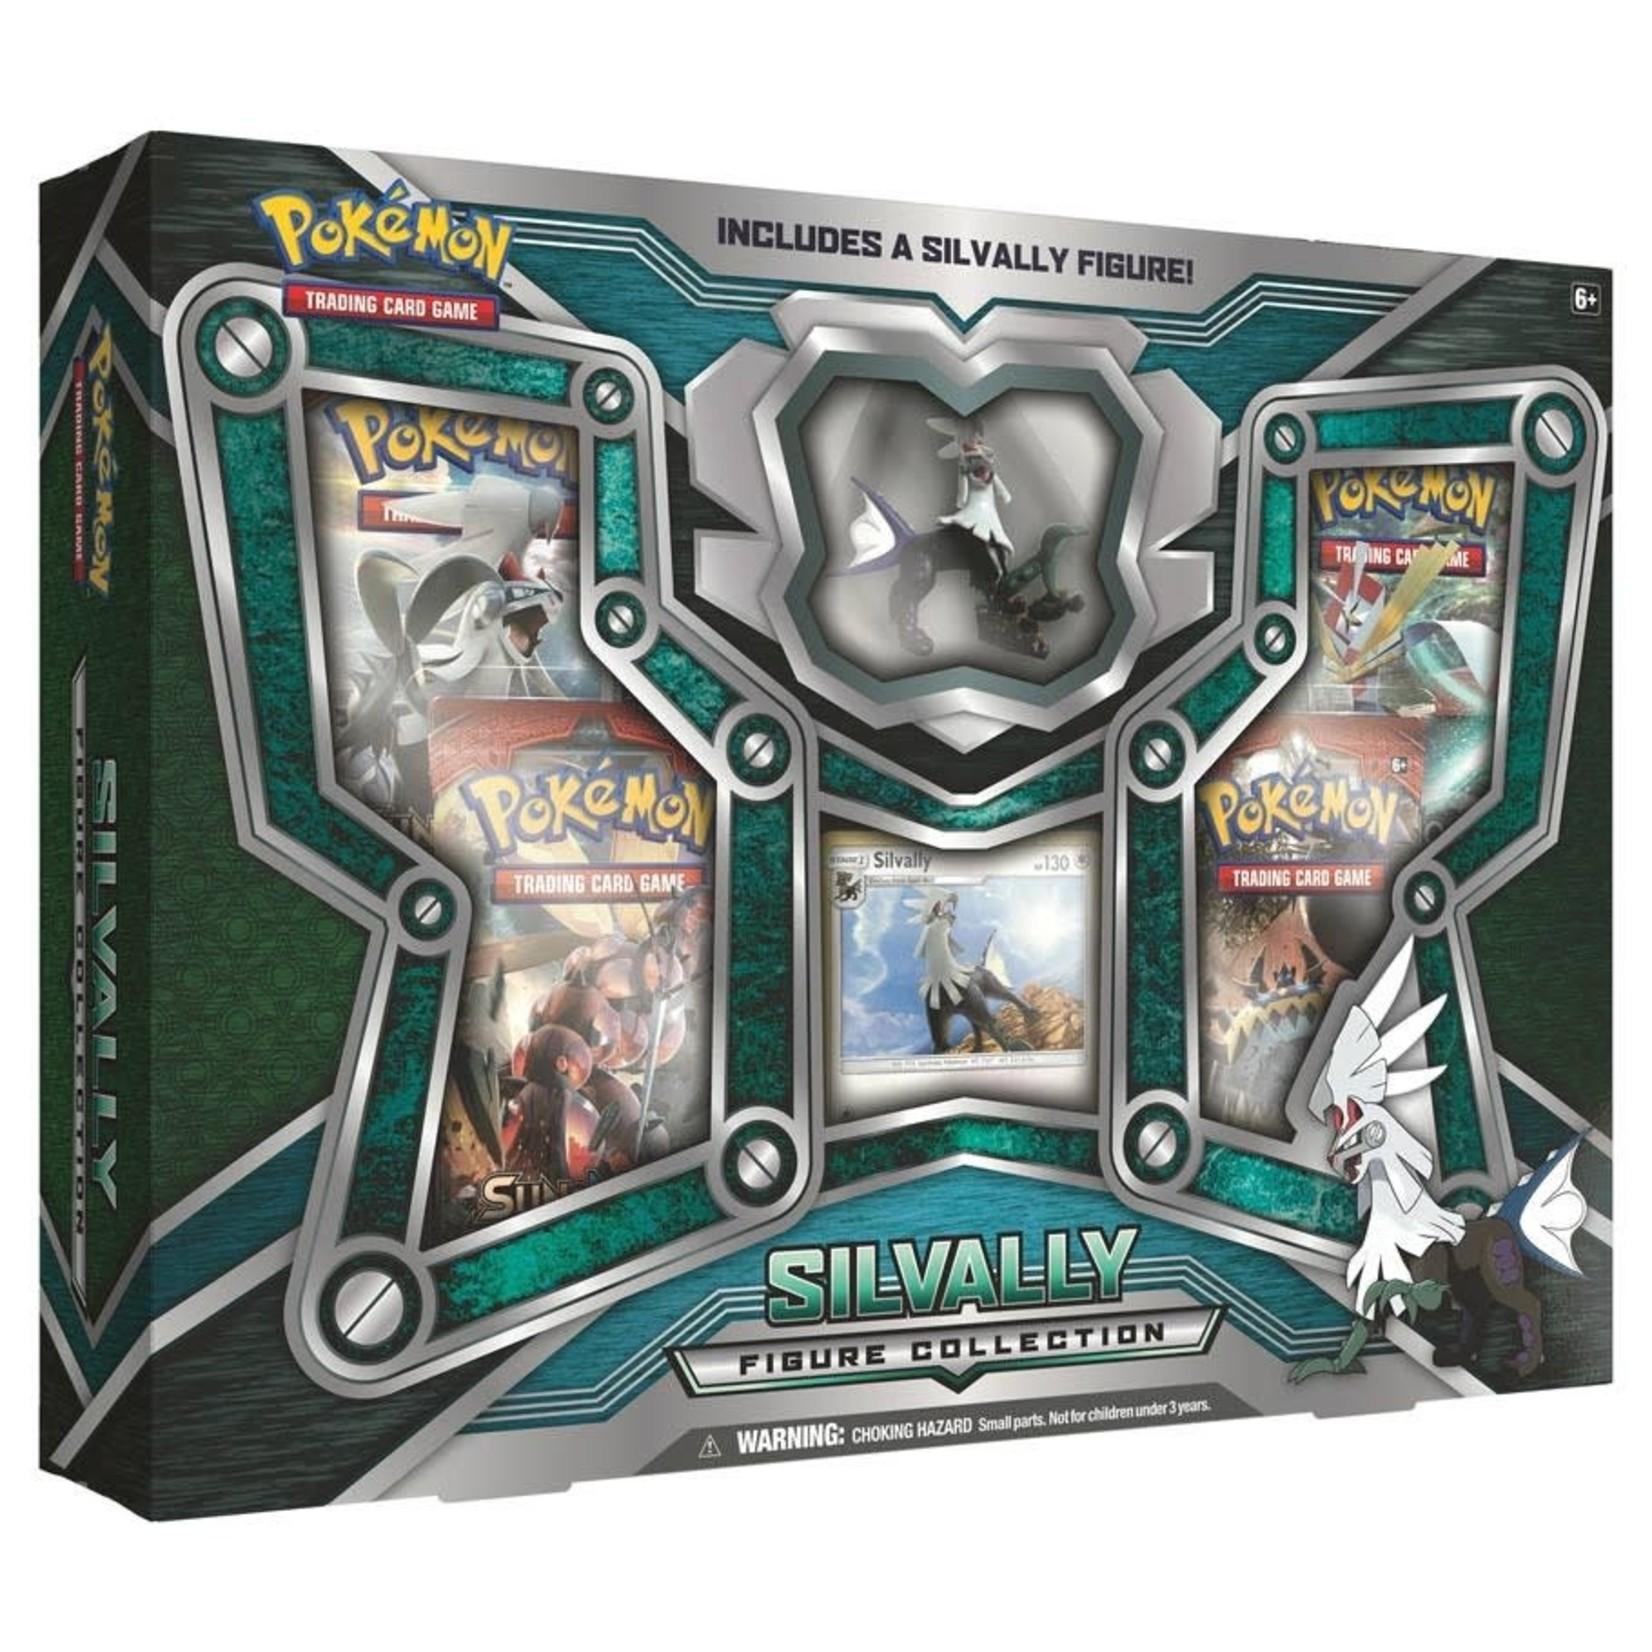 Pokemon International PKM : Silvally Figure Collection